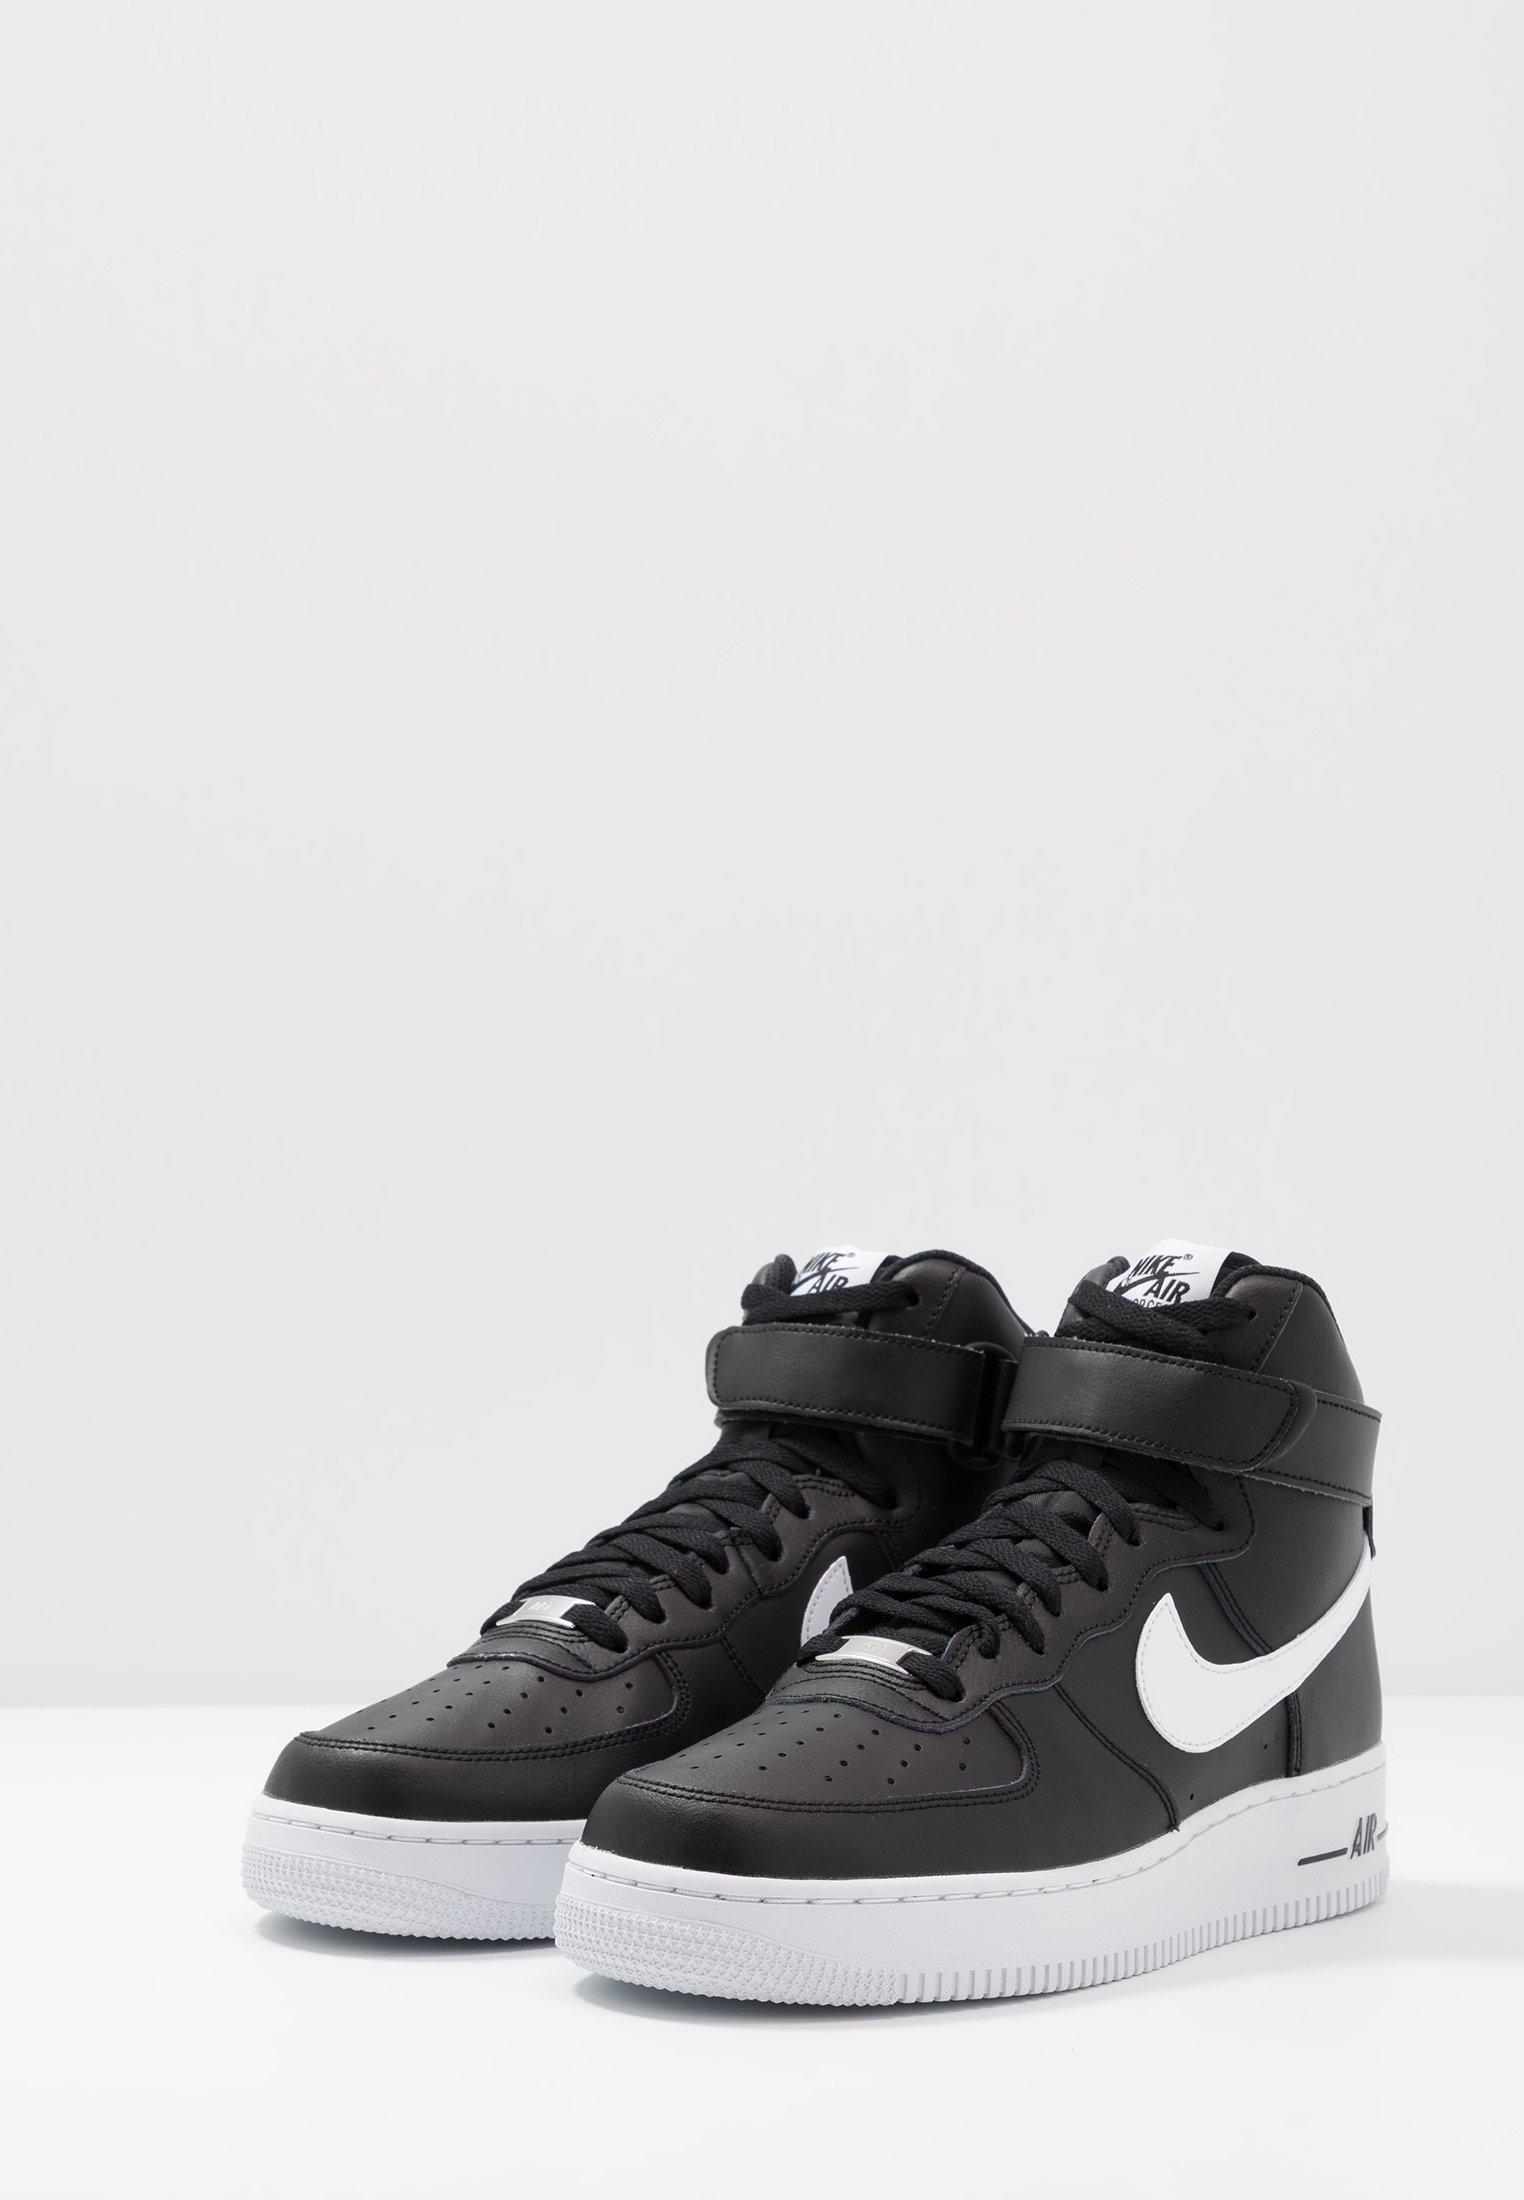 Nike Sportswear Air Force 1 '07 - Höga Sneakers Black/white